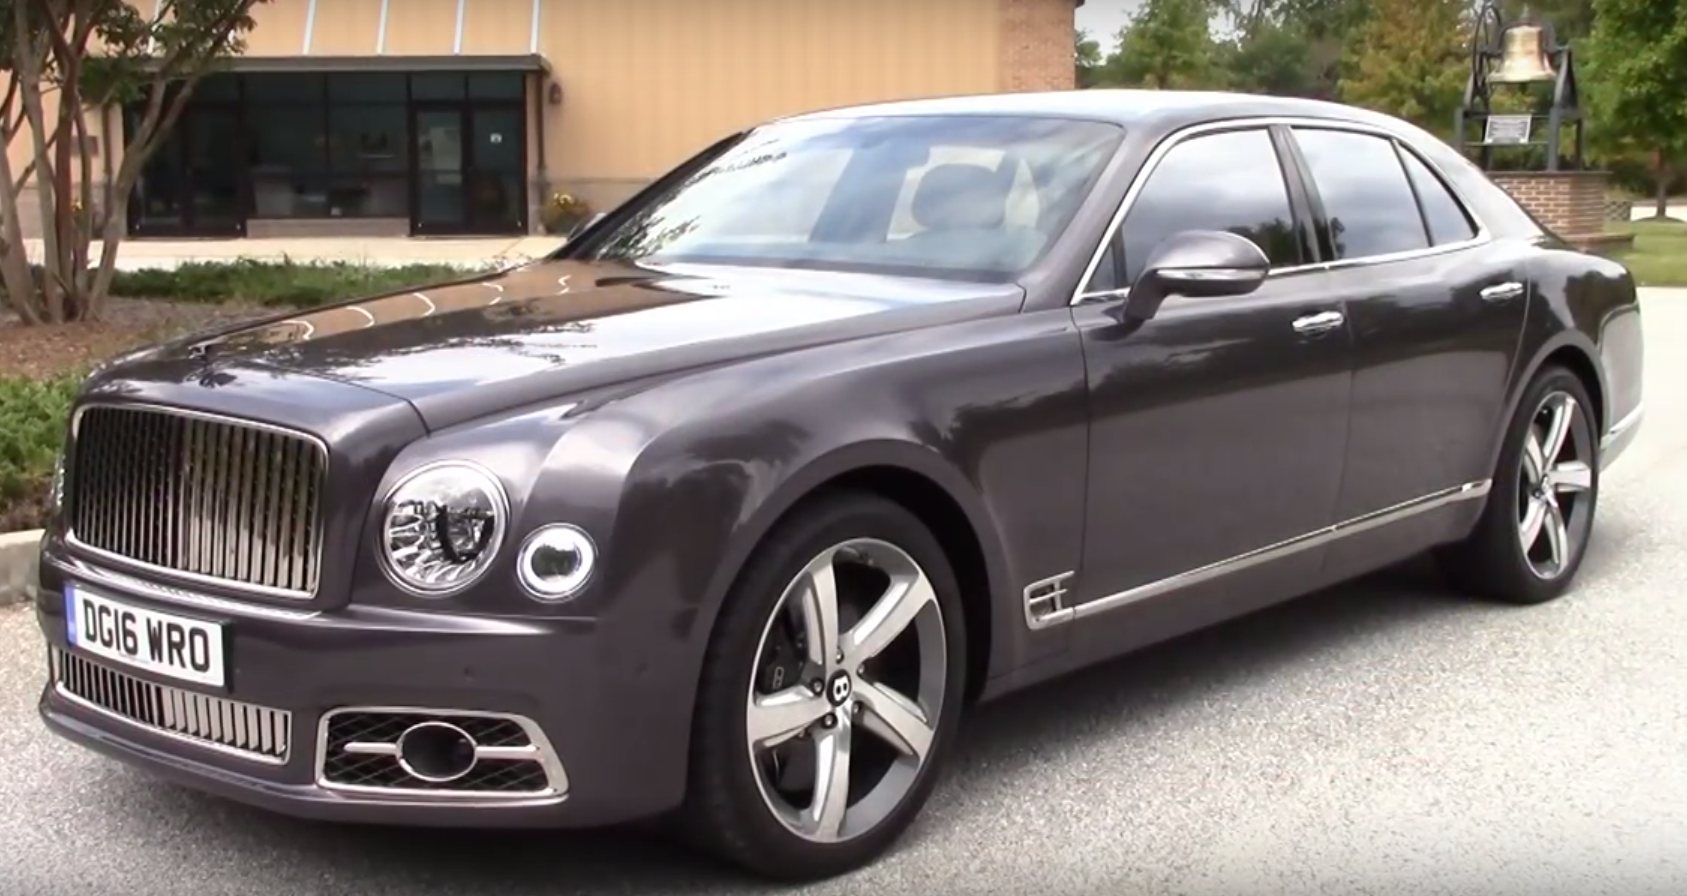 Премиум класс Bentley Mulsanne